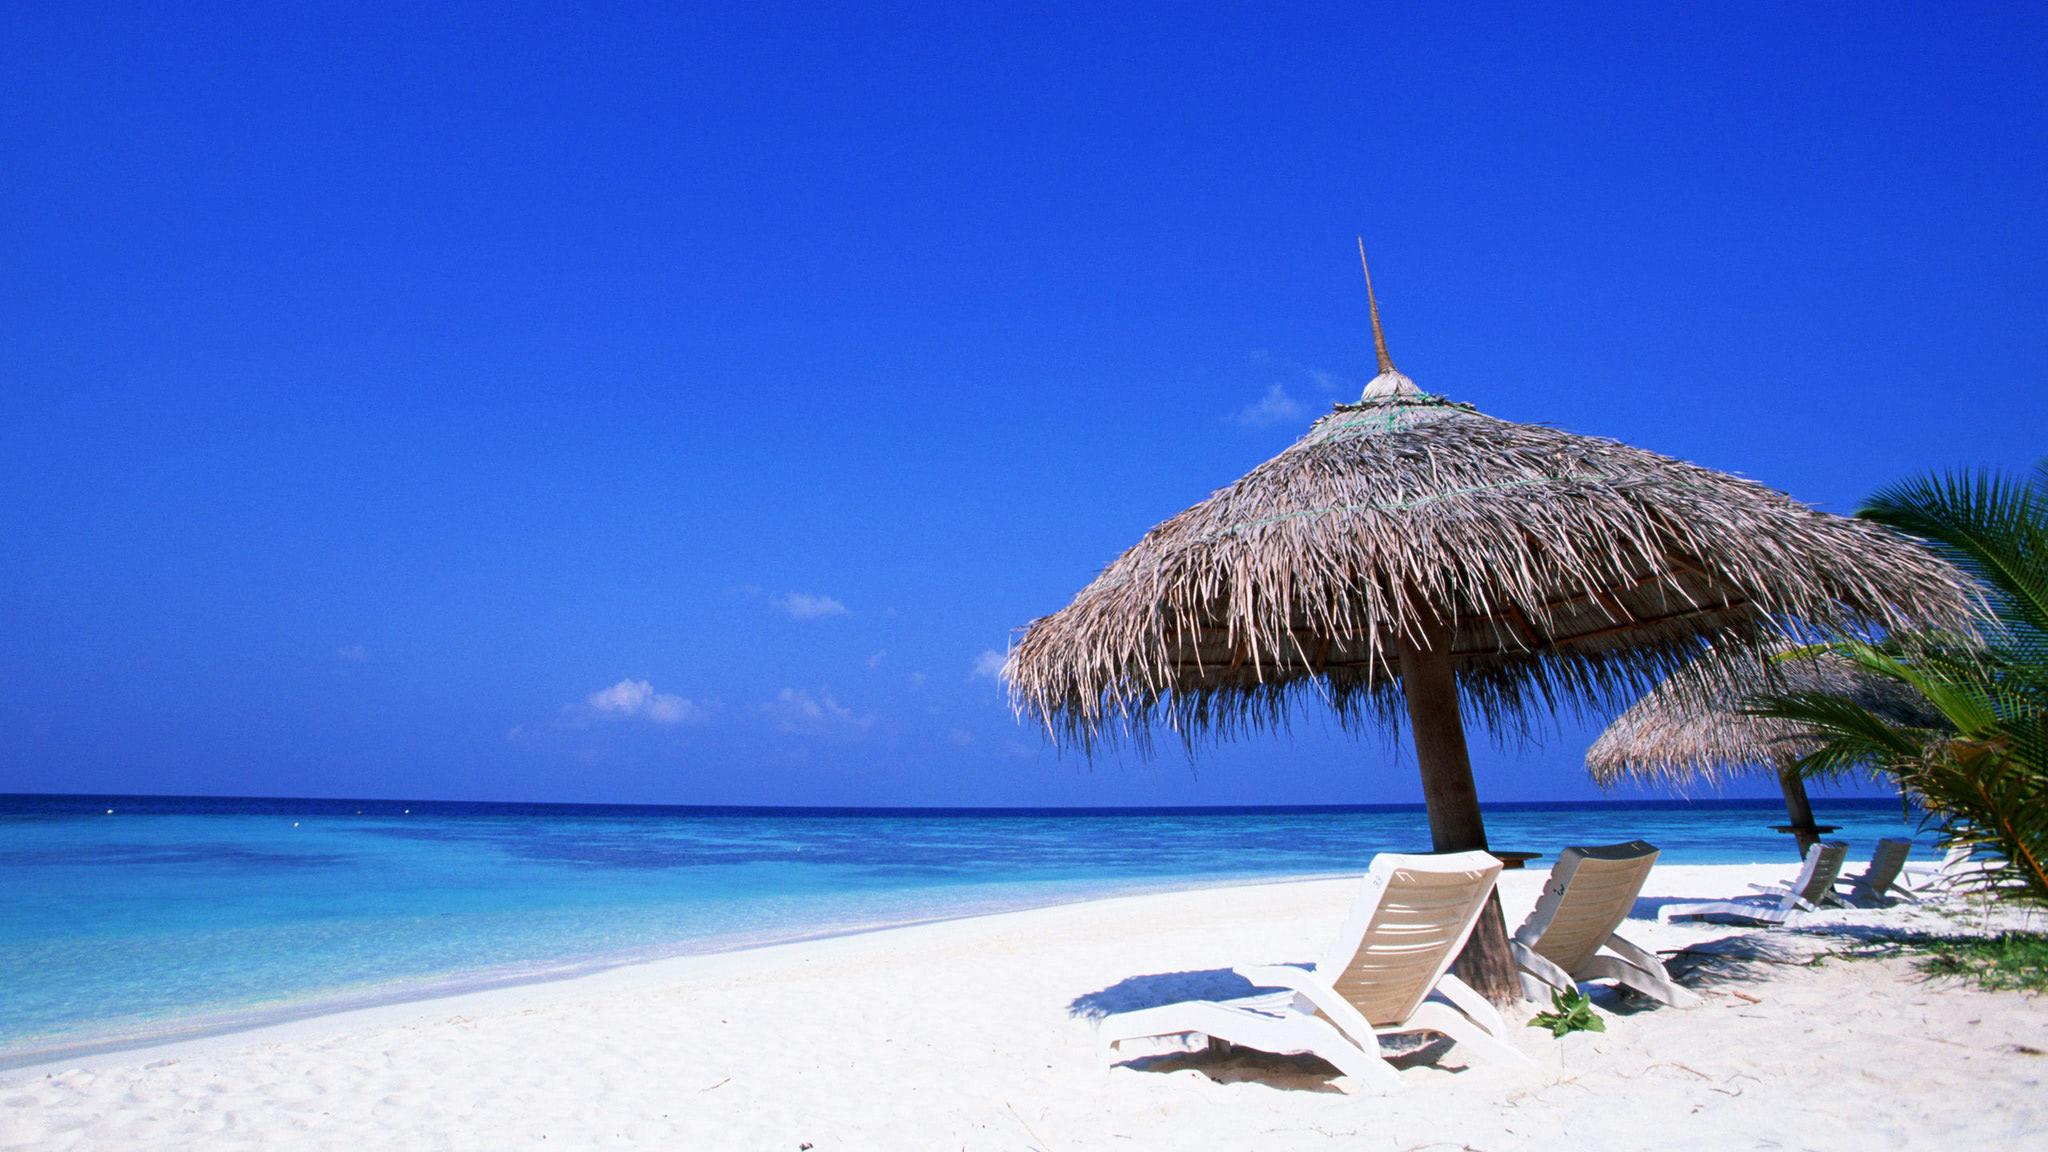 tropical sandy beach wallpaper - photo #5